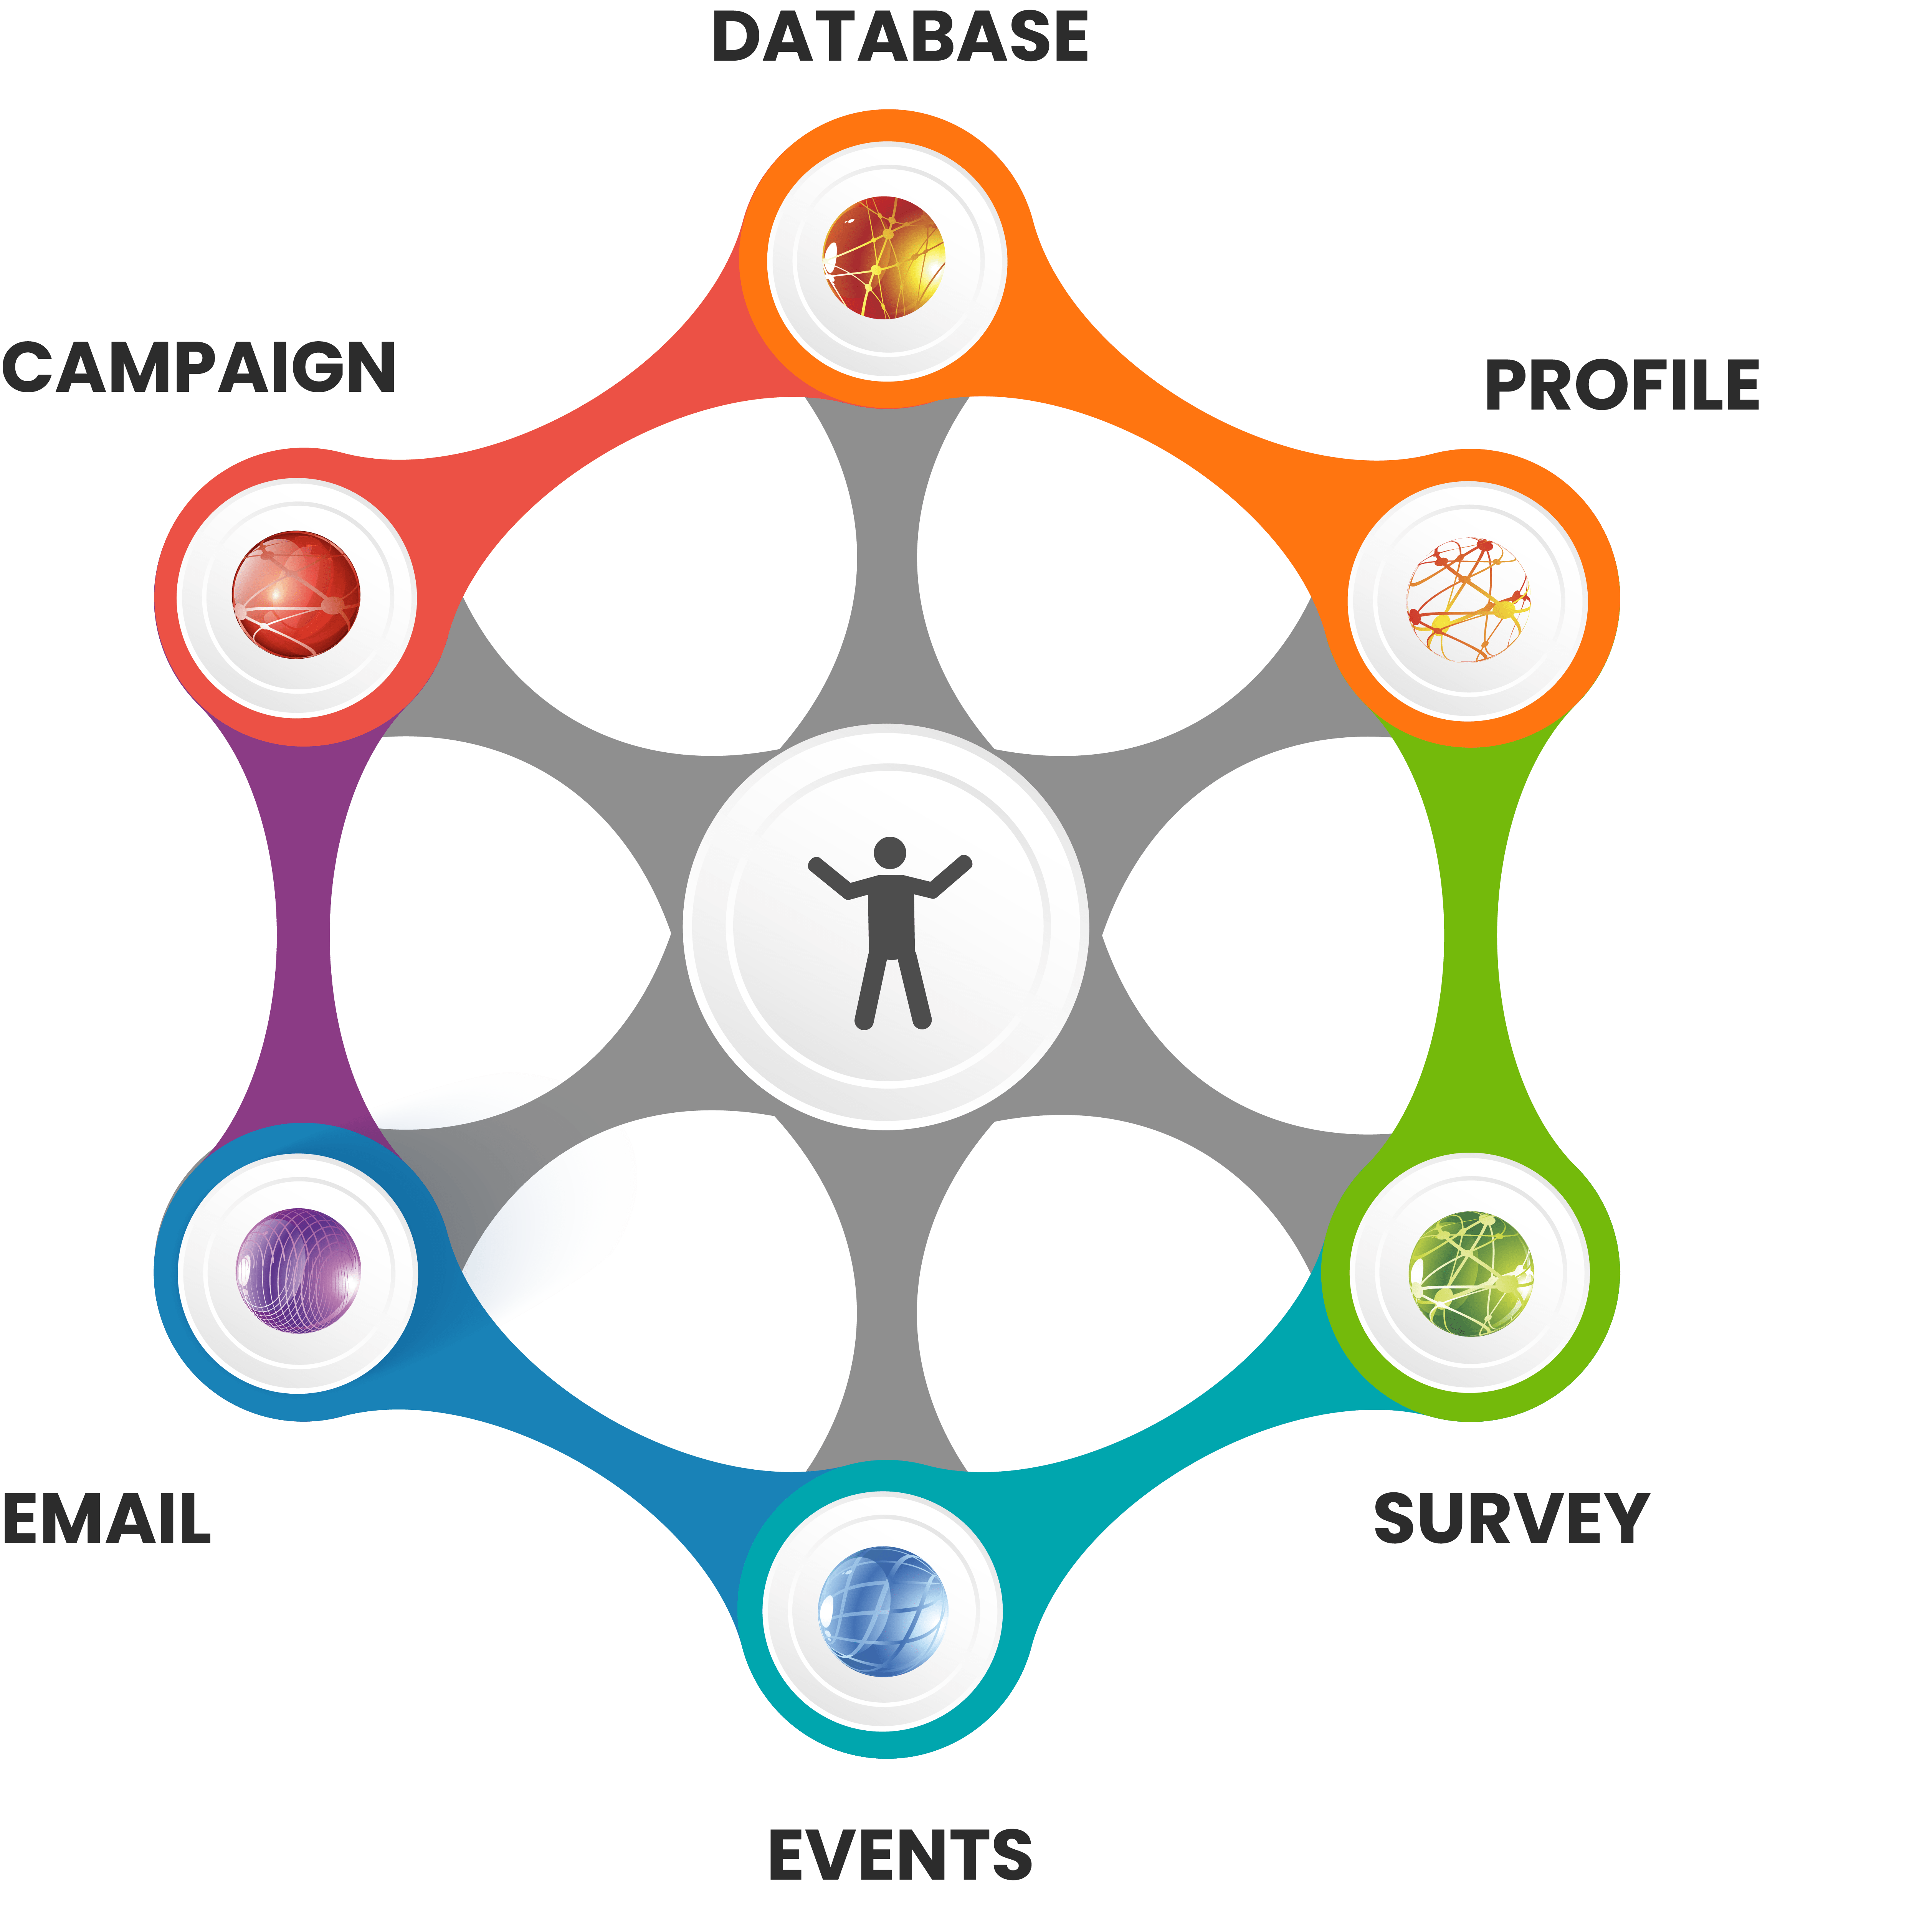 Hyper Hub Database Marketing Engagement CRM Software Platform Email, Survey, Events, Campaigns